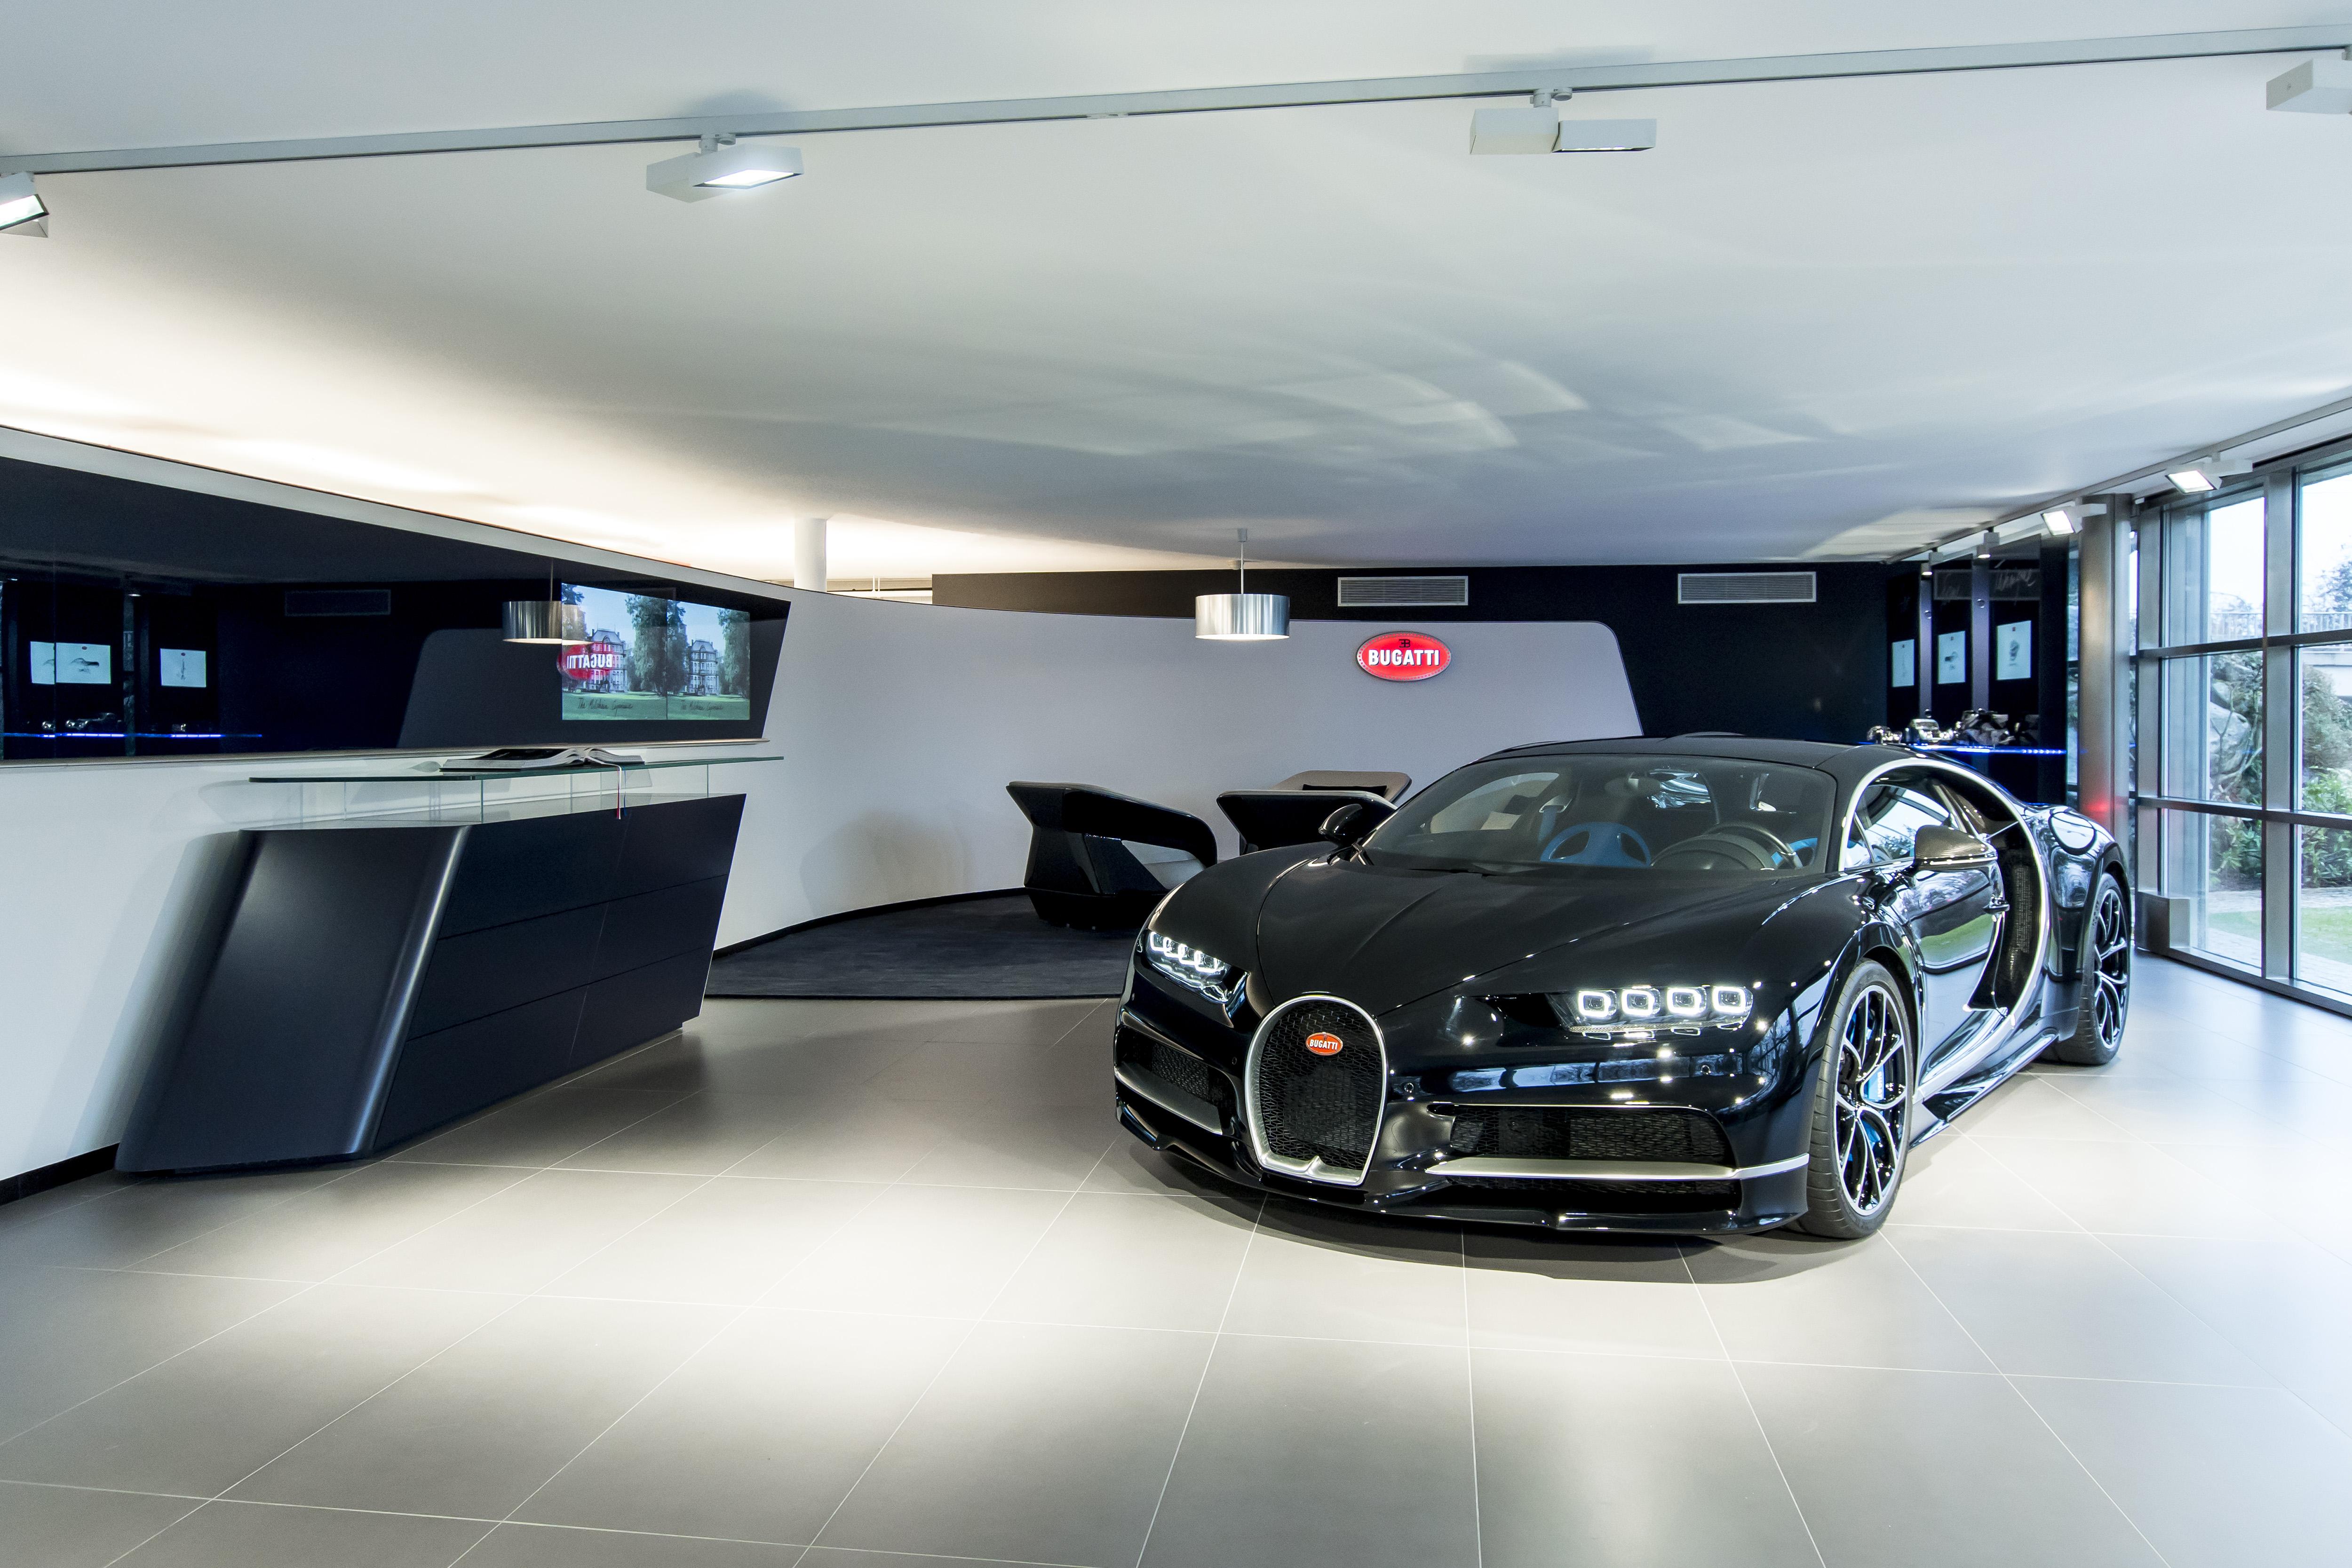 Bugatti Backgrounds on Wallpapers Vista